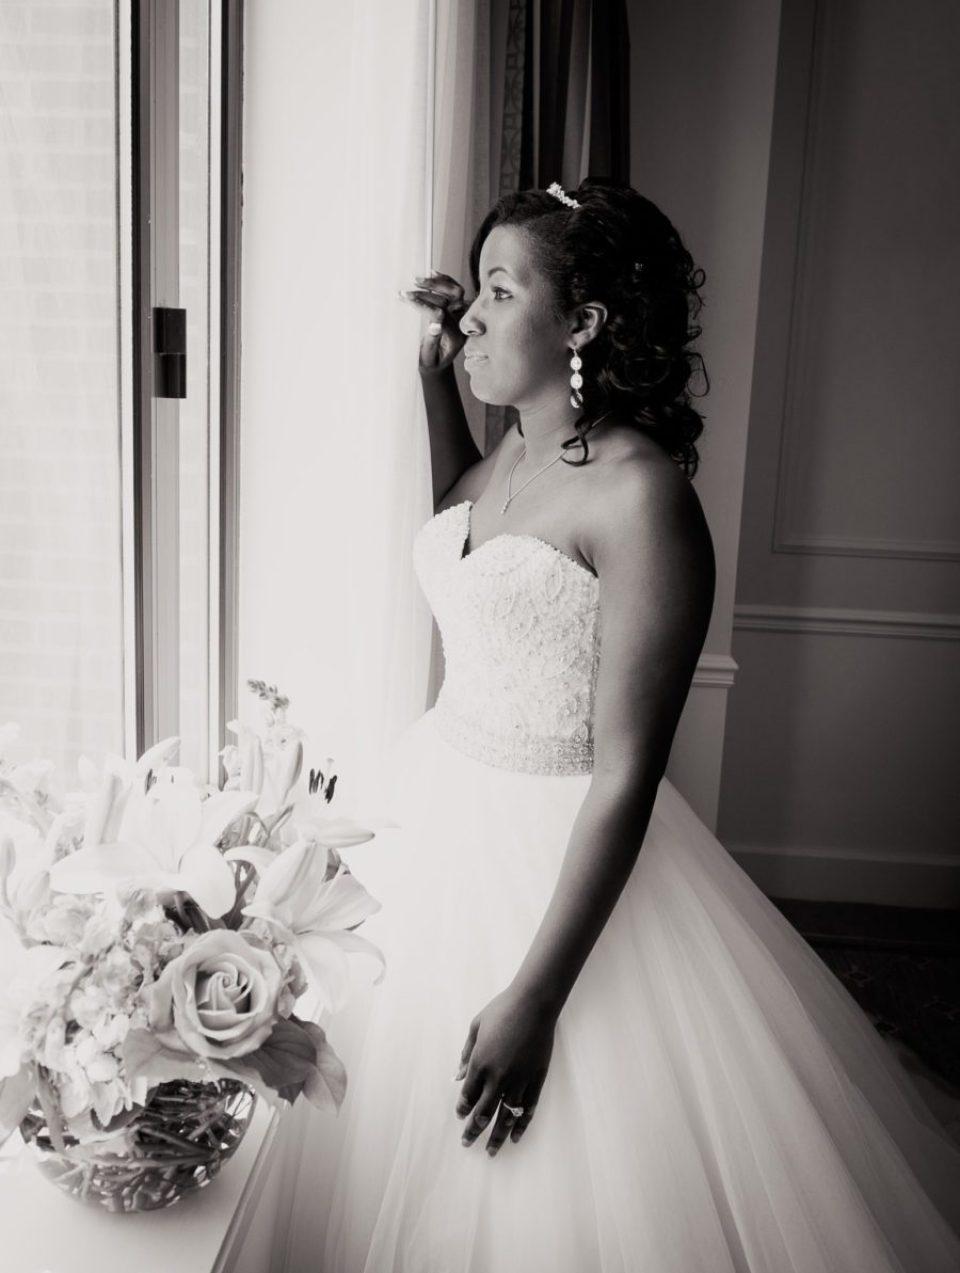 Getting-Dressed-66-of-73-960x1273 Classic Charleston Nuptials